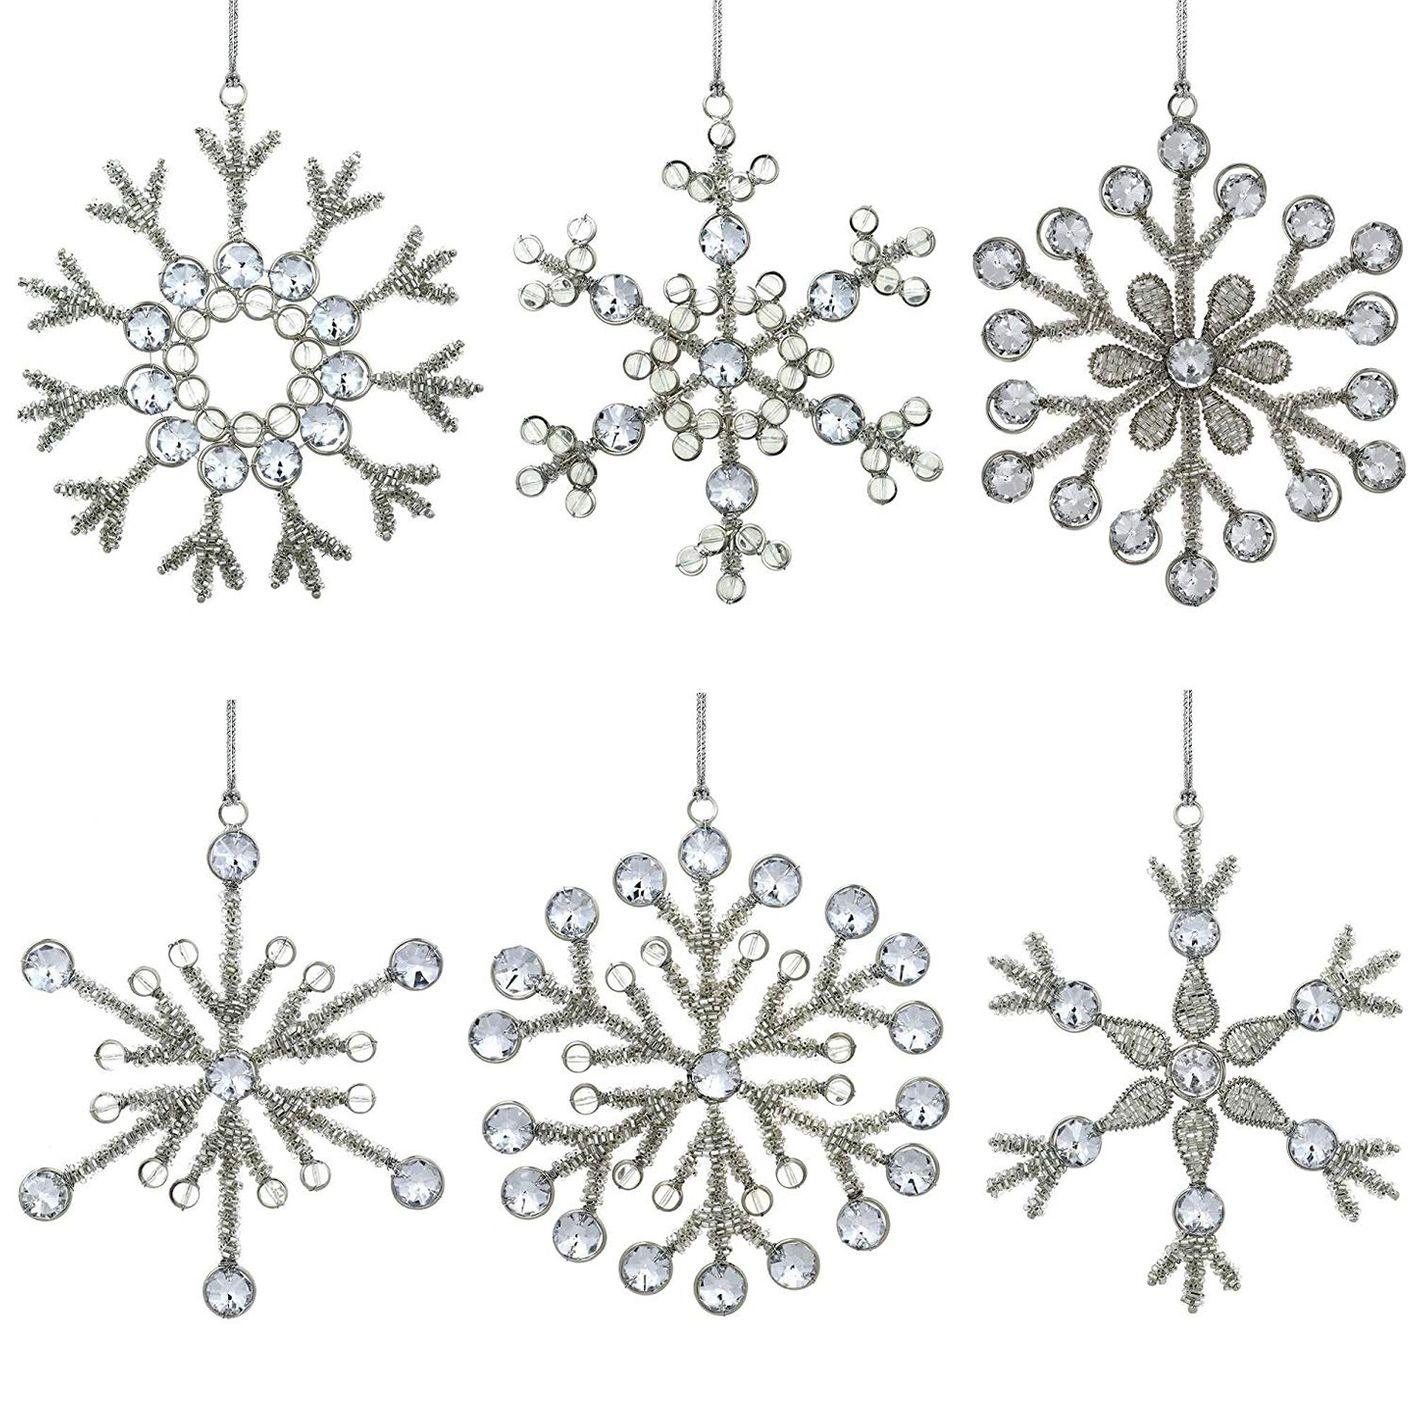 ShalinIndia Set of 6 Handmade Snowflake Iron and Glass Pendant Christmas Ornaments